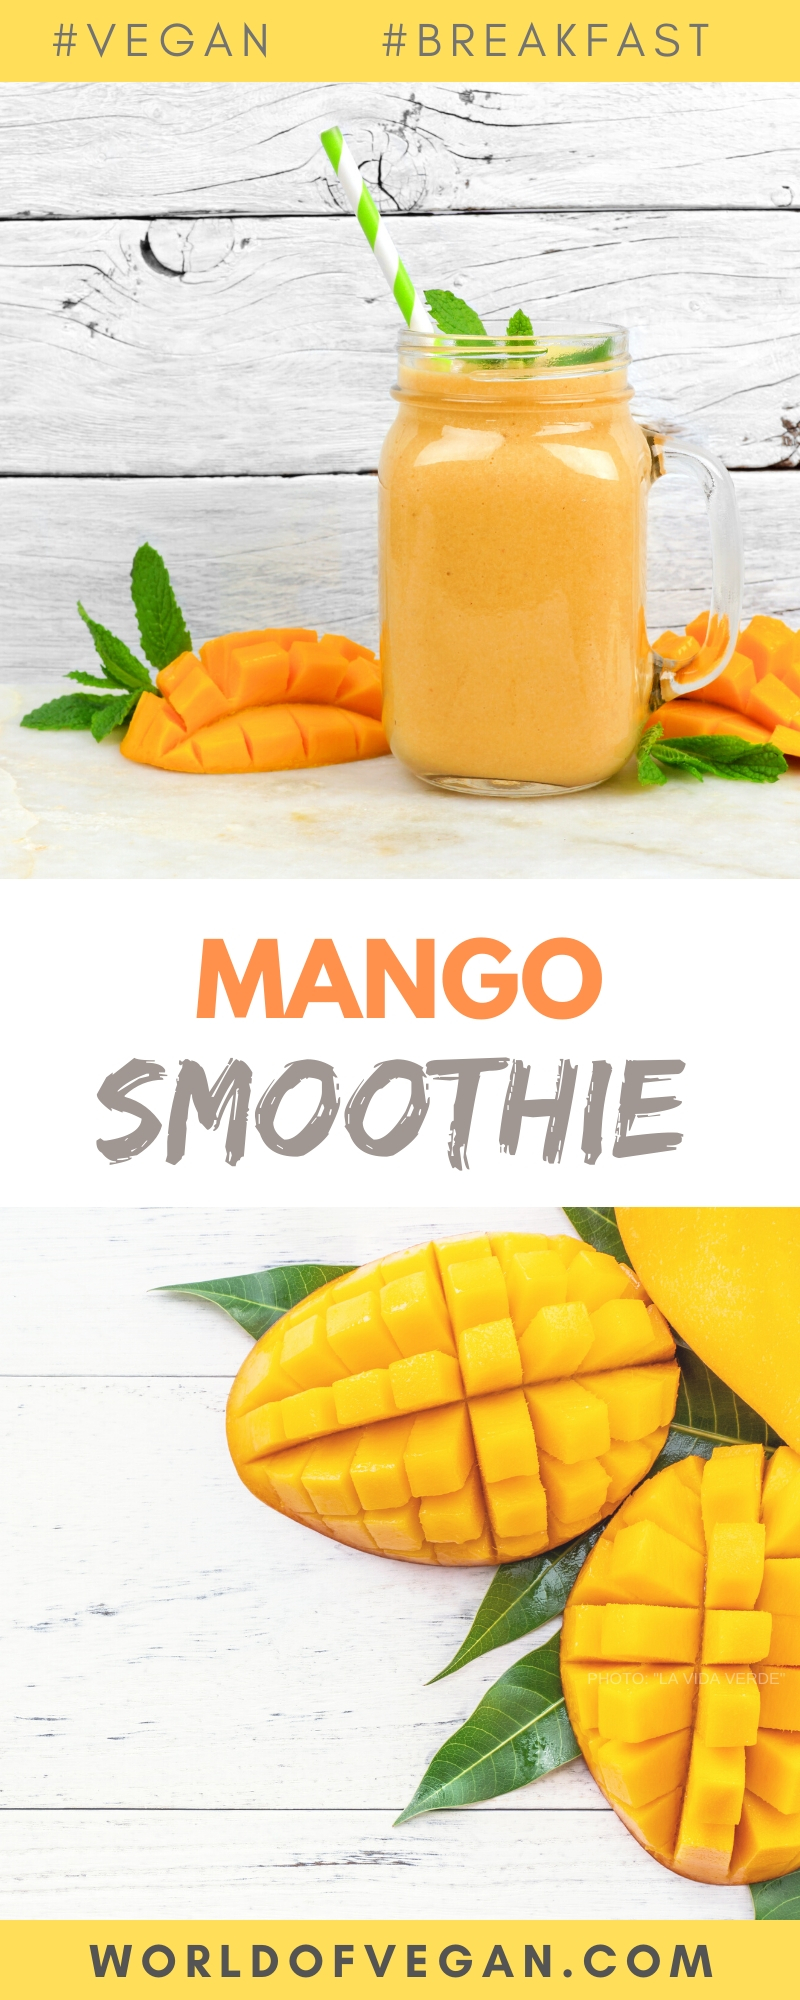 Tropical Mango Smoothie | World of Vegan | #mango #banana #smoothie #breakfast #vegan #worldofvegan